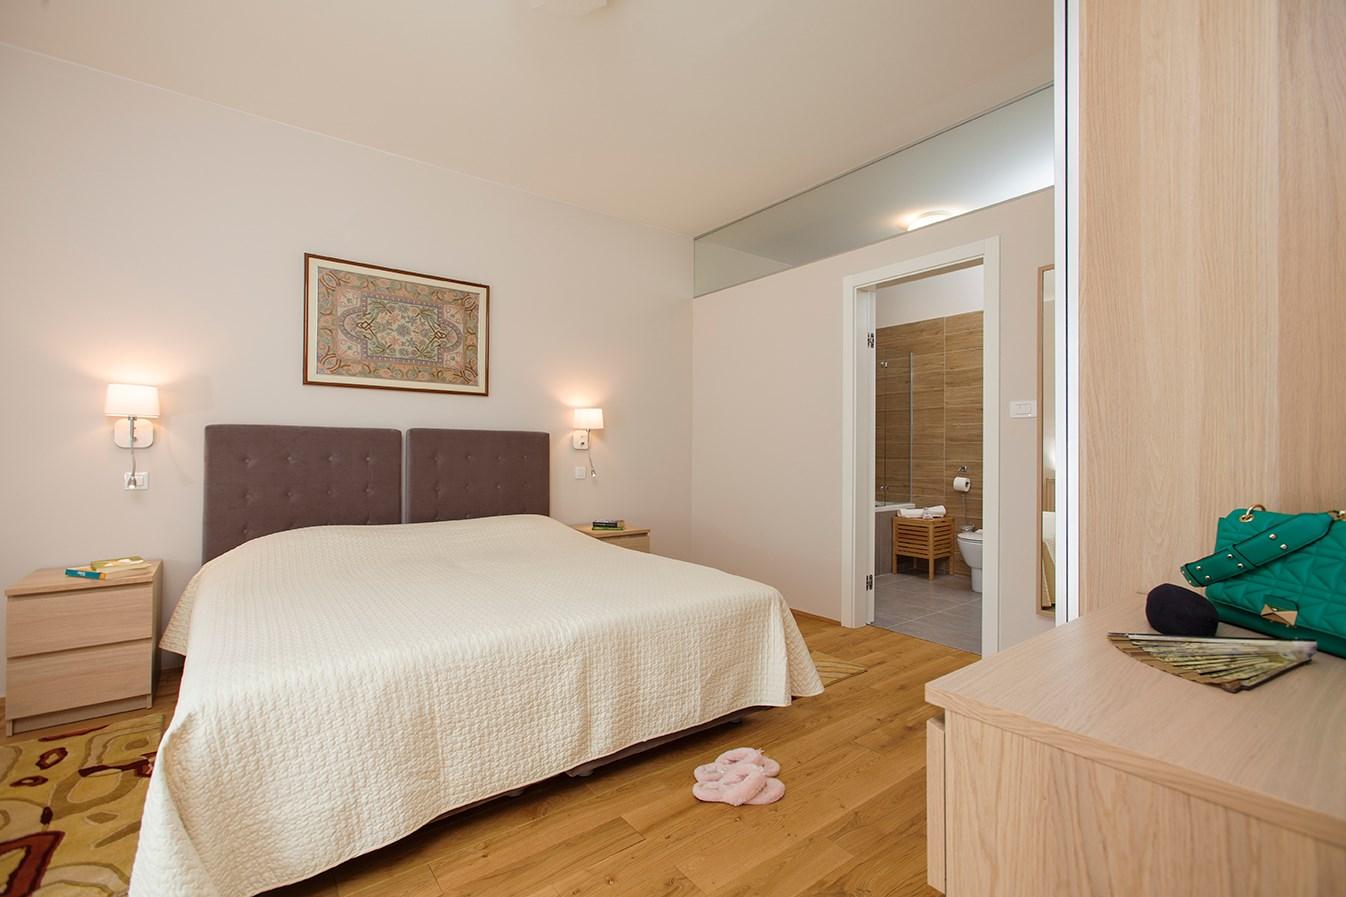 Ferienhaus  (2474393), Kostanje, , Dalmatien, Kroatien, Bild 11